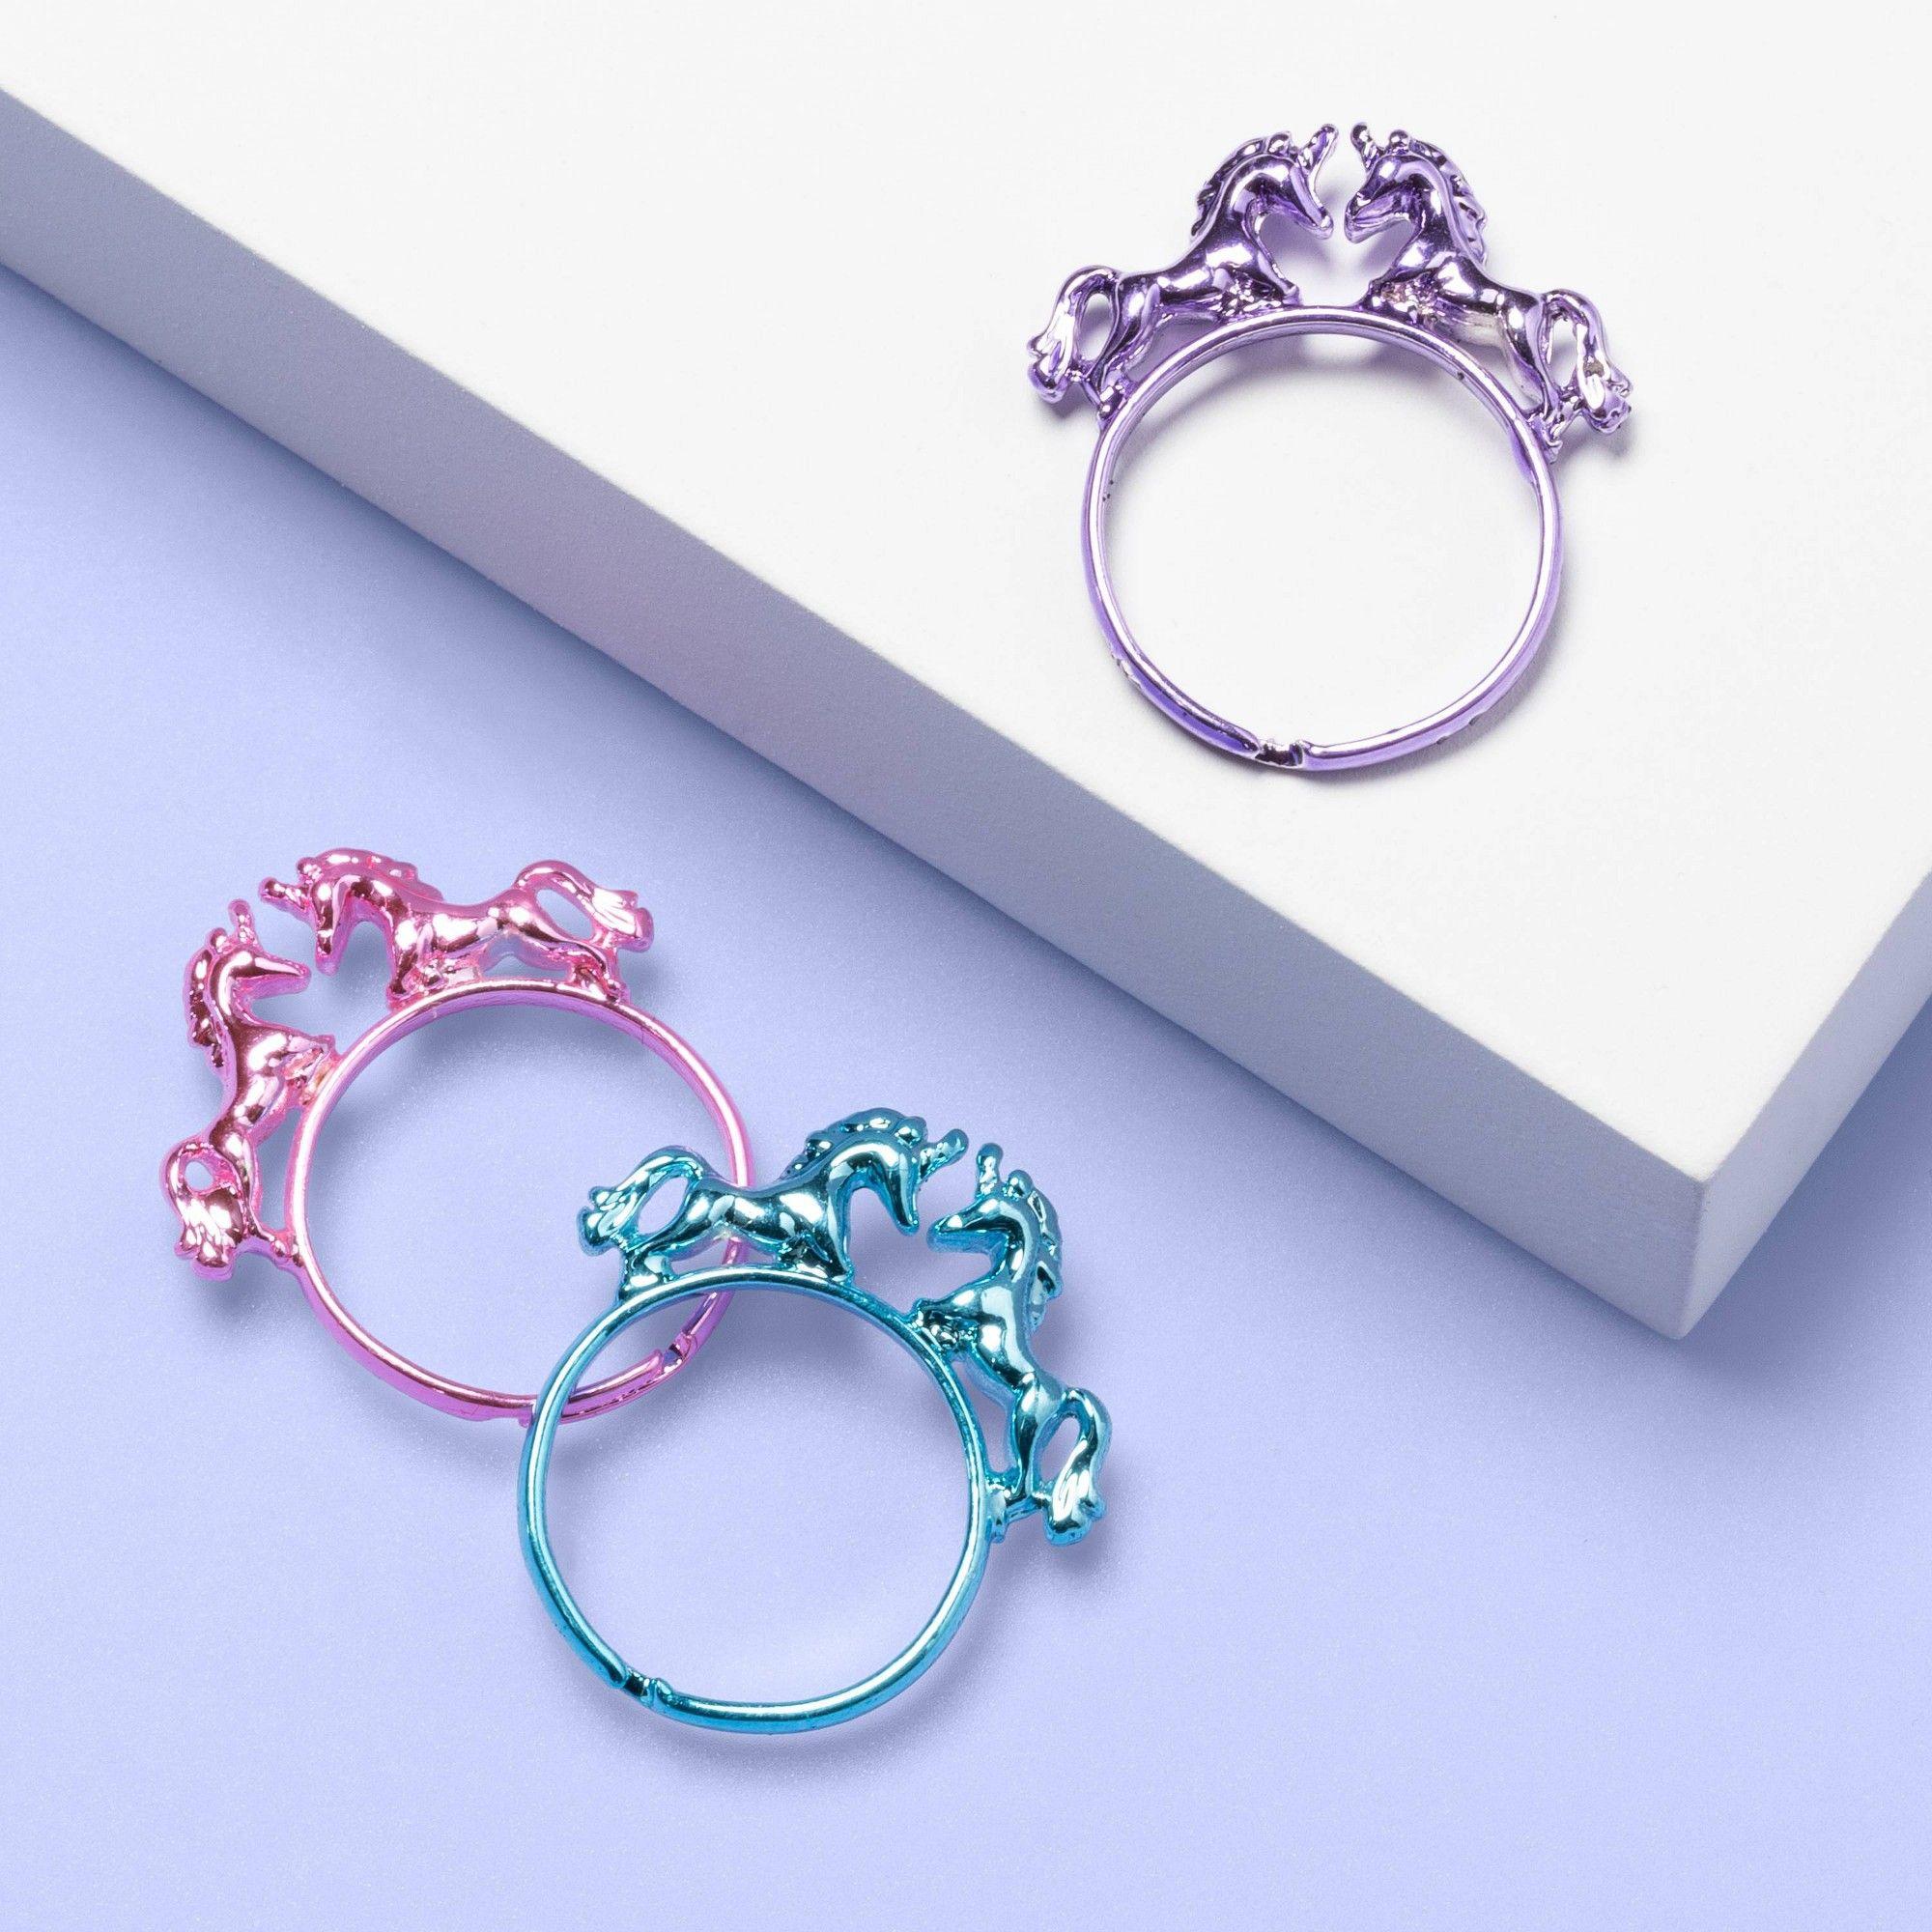 Girls 3pk unicorn ring set more than magic with